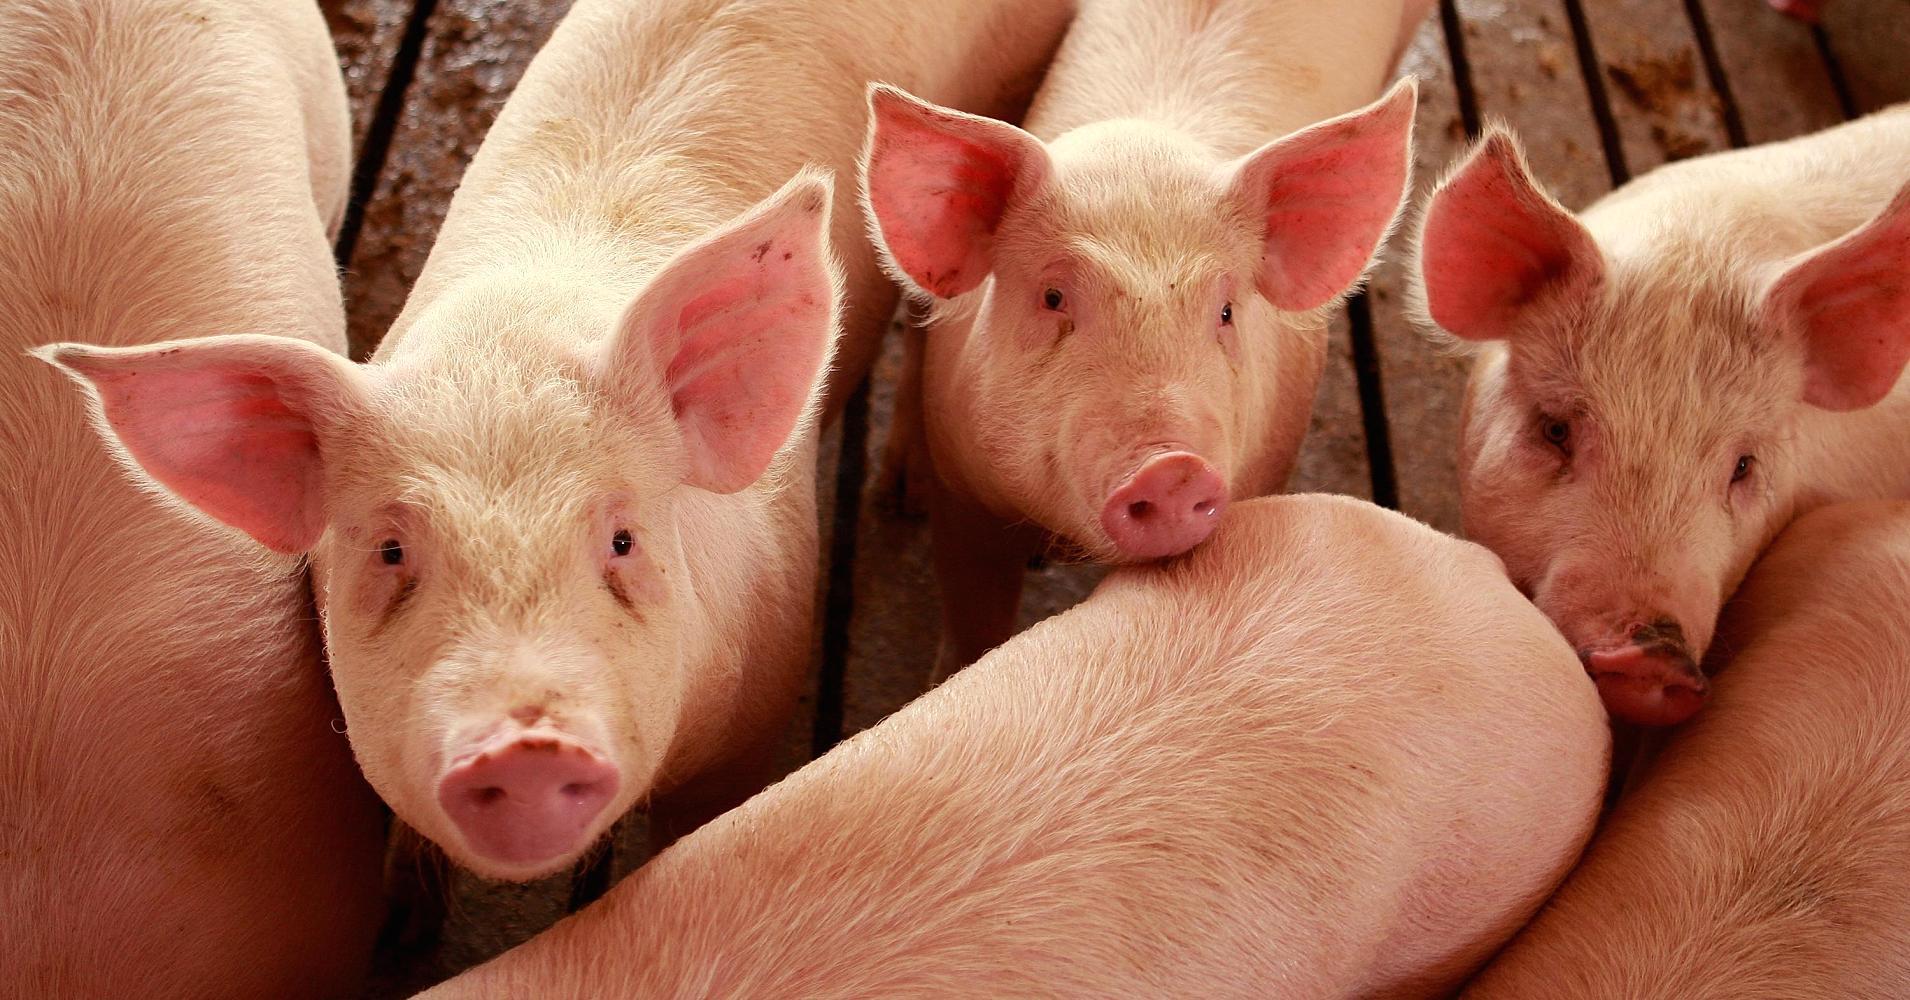 Lean Hogs: i prezzi esplodono!